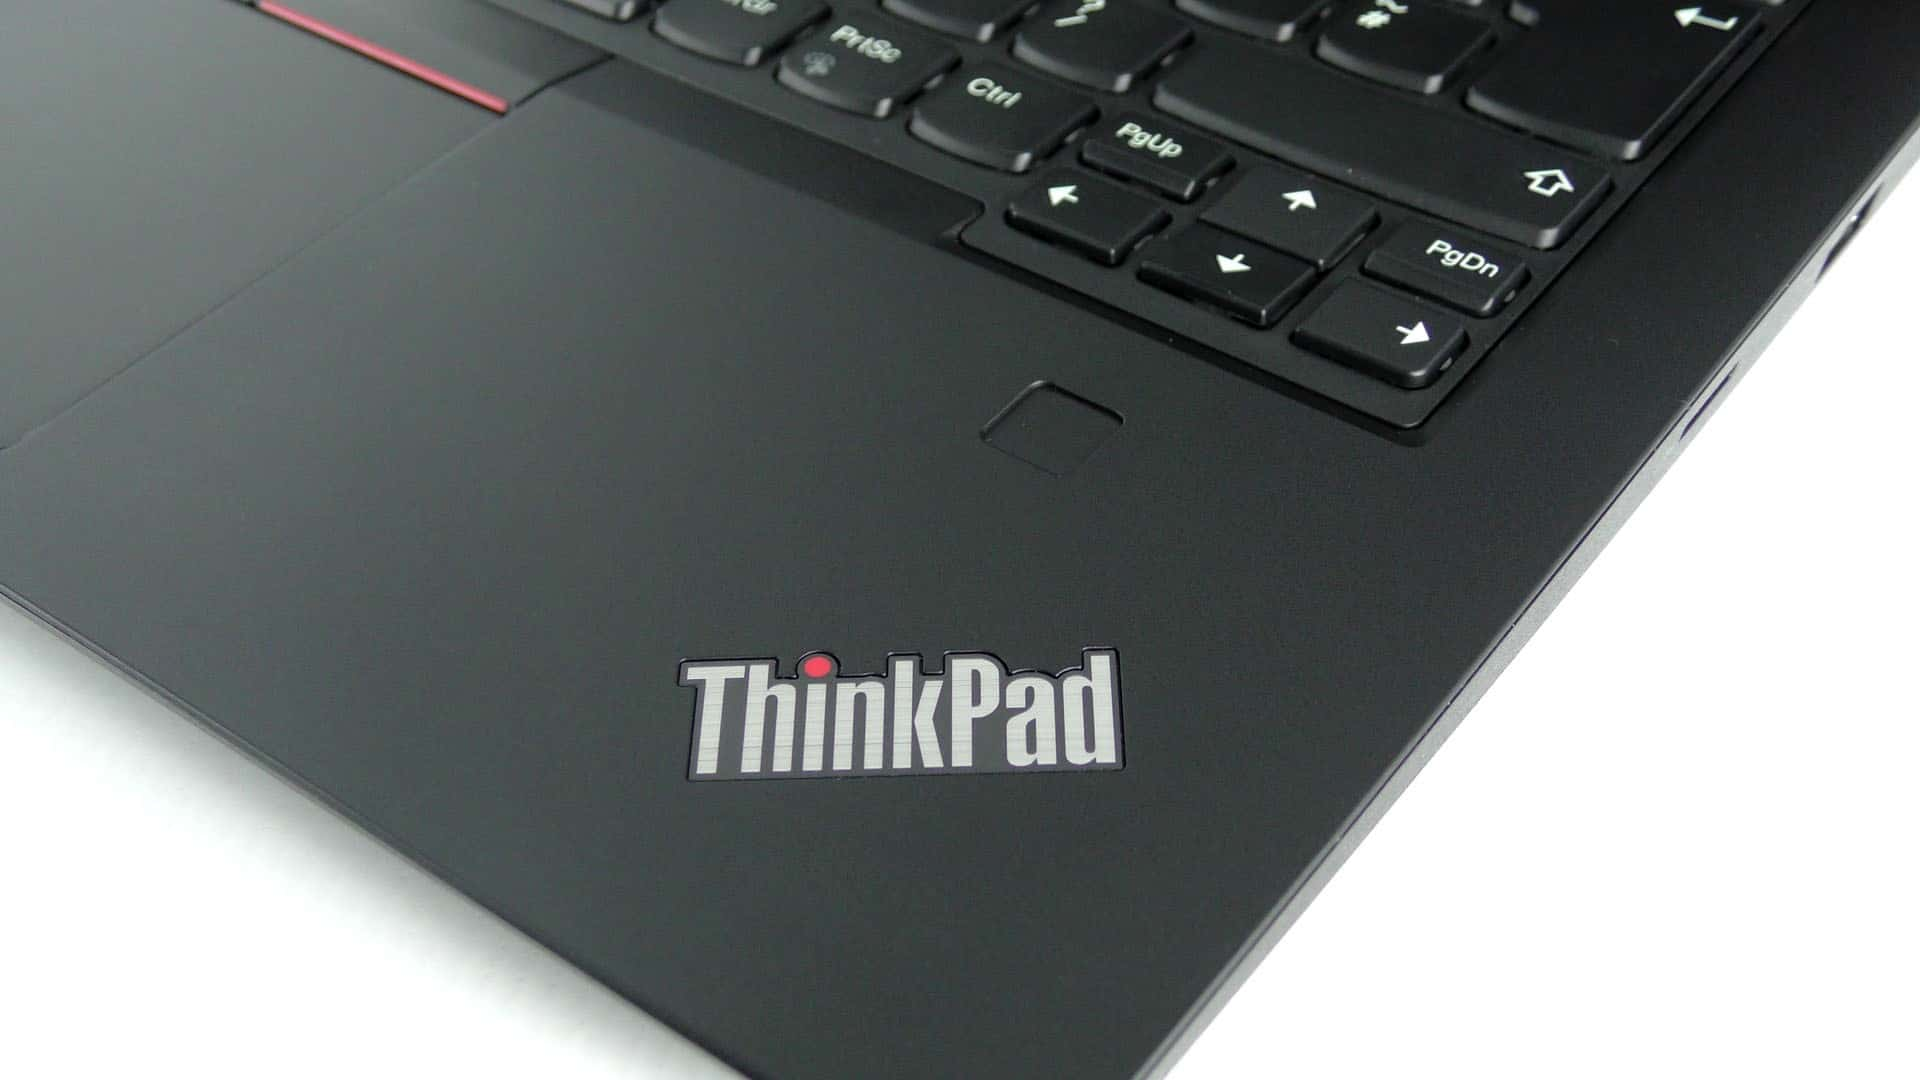 Lenovo ThinkPad E480 - czytnik linii papilarnych